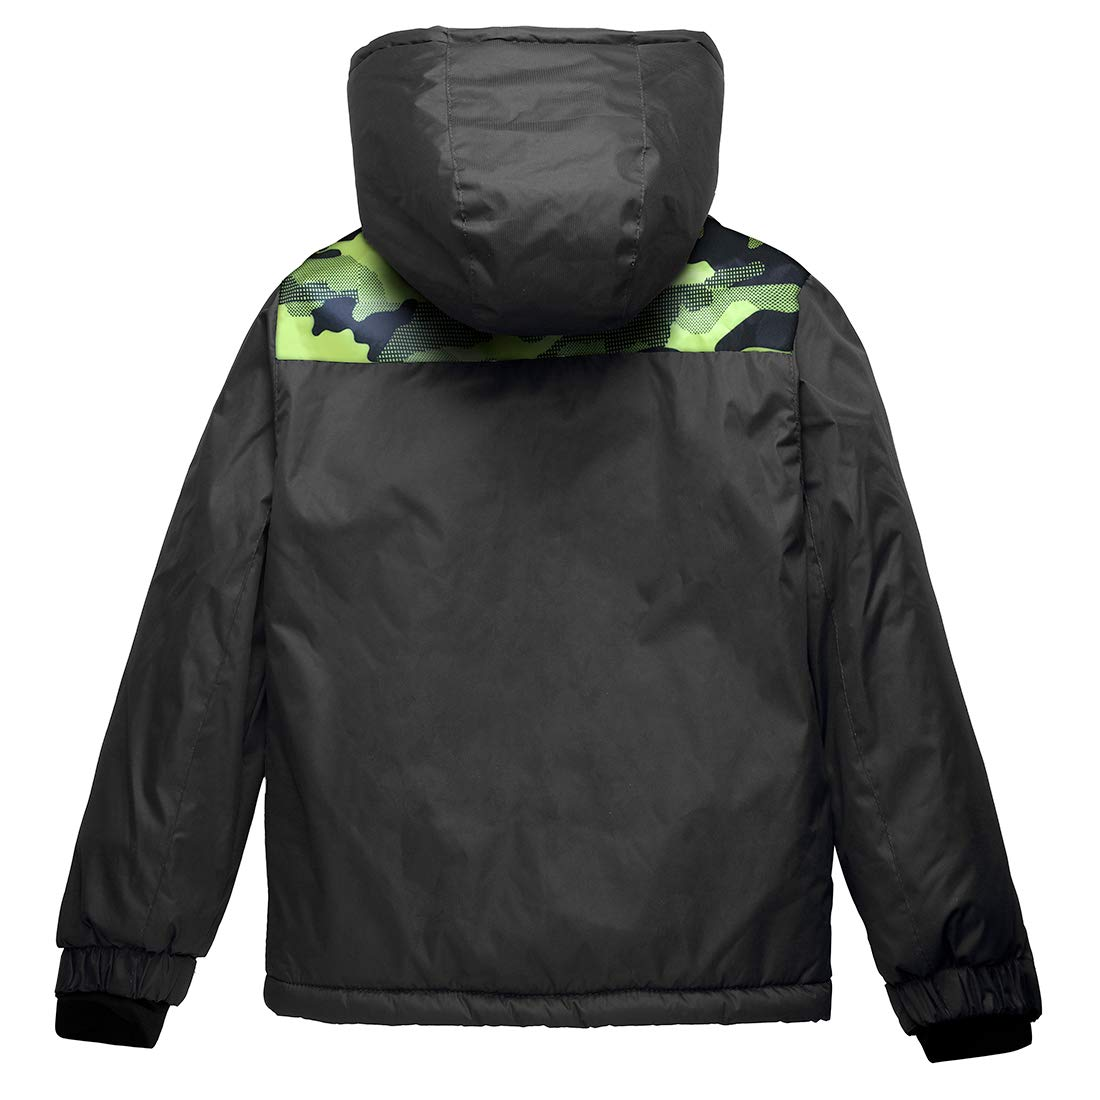 705c74465 Amazon.com  Wantdo Boy s Ski Jacket Waterproof Thick Winter Coat ...